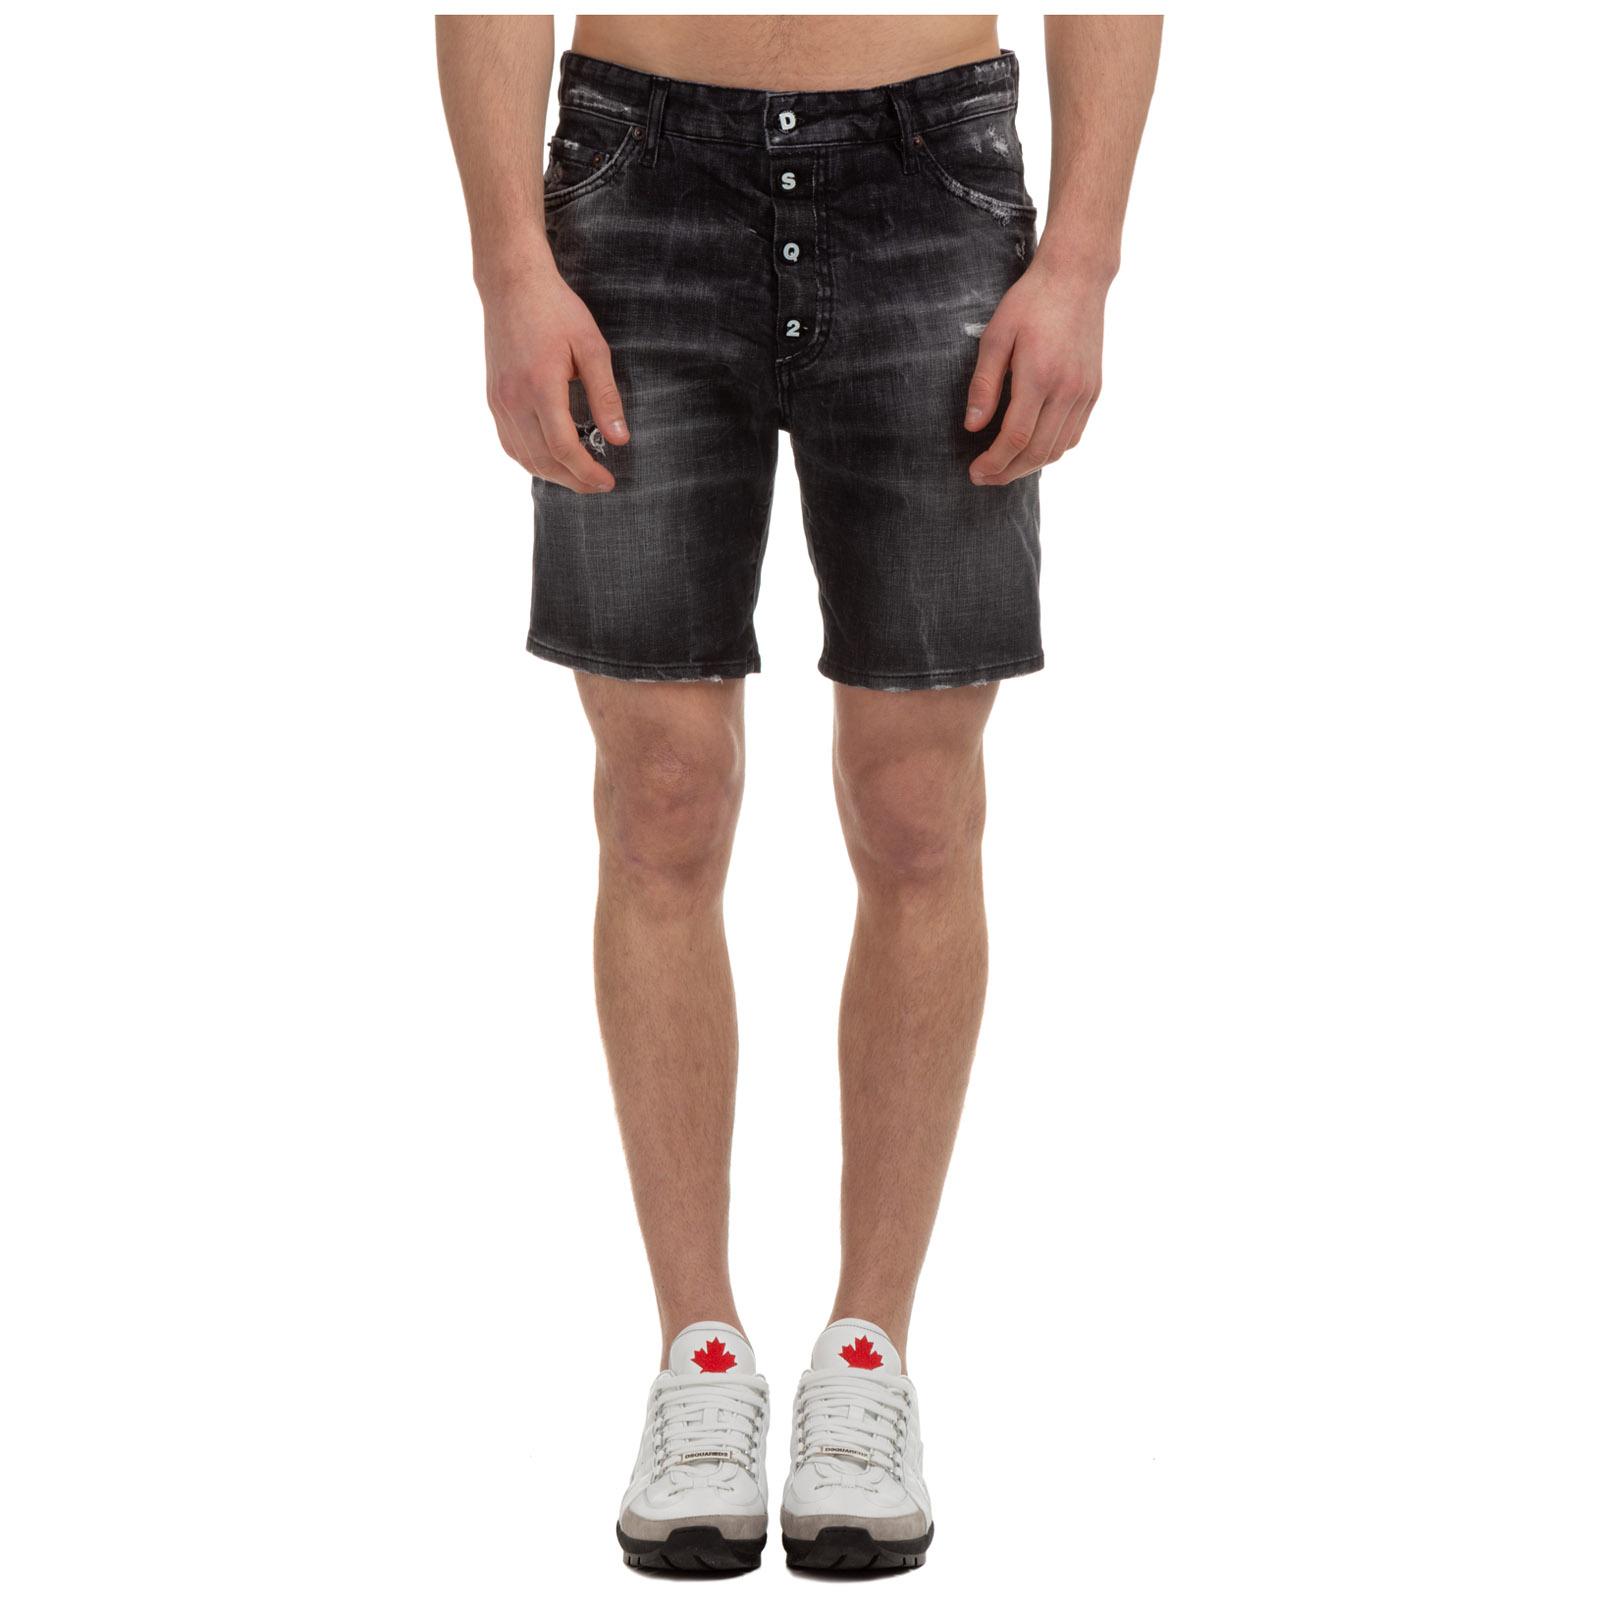 Dsquared2 Shorts MEN'S SHORTS BERMUDA 1964